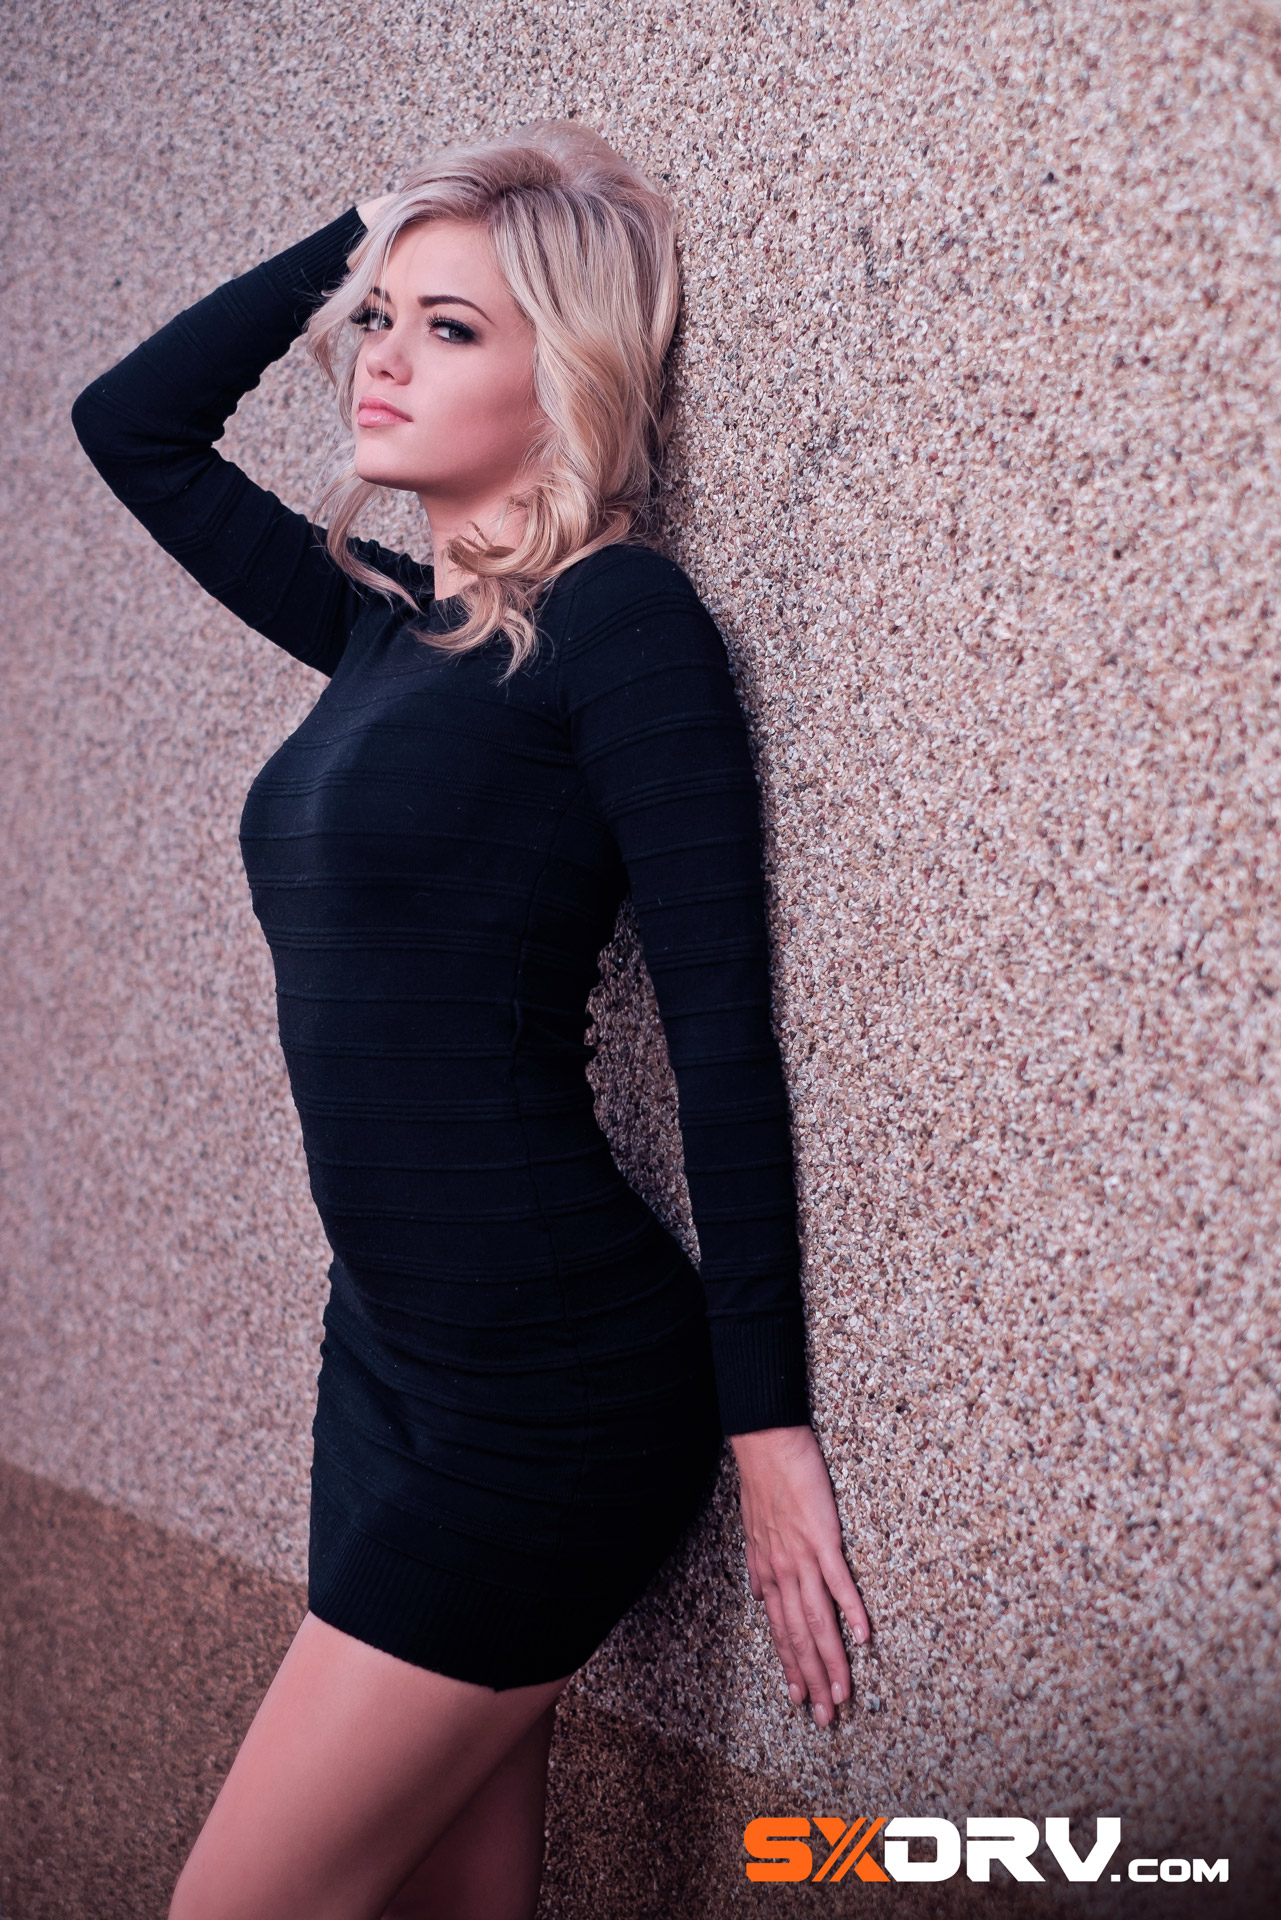 Rochelle Sally Vlok - Backdraft Cobra - Exclusive ...